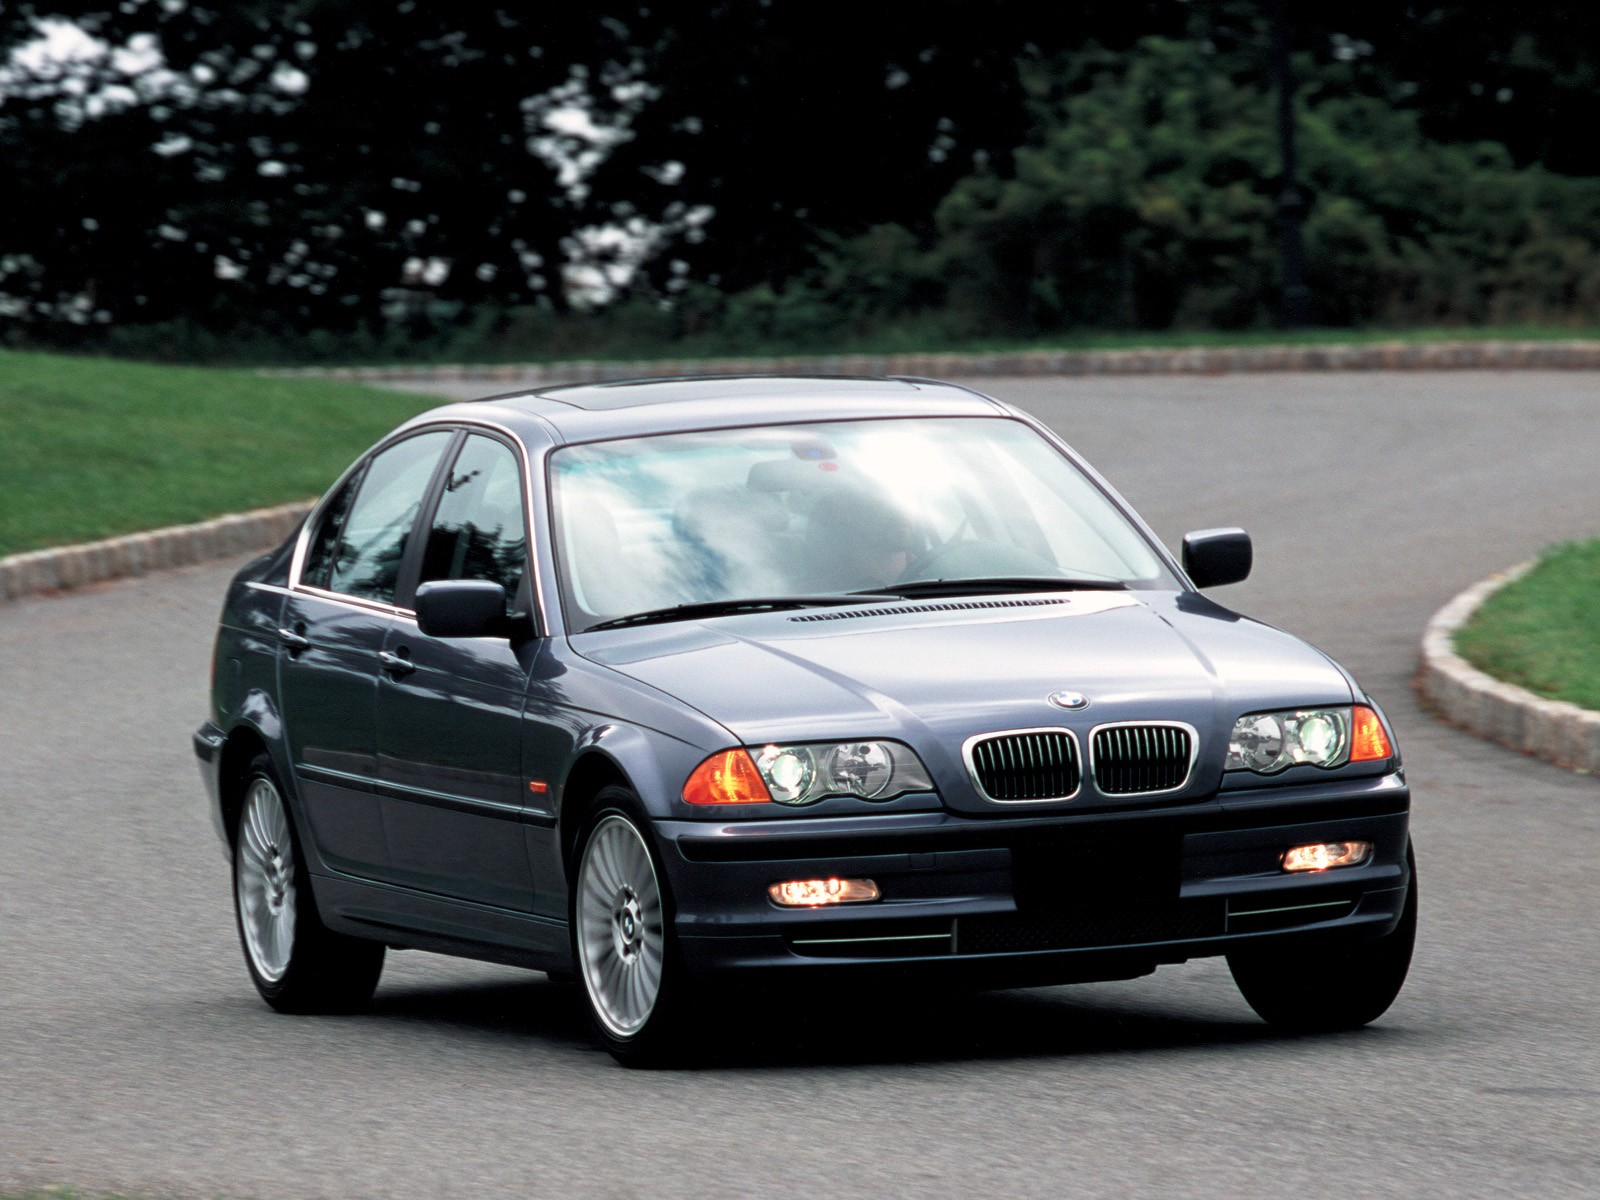 bmw 3 series e46 specs 1998 1999 2000 2001 2002 autoevolution. Black Bedroom Furniture Sets. Home Design Ideas